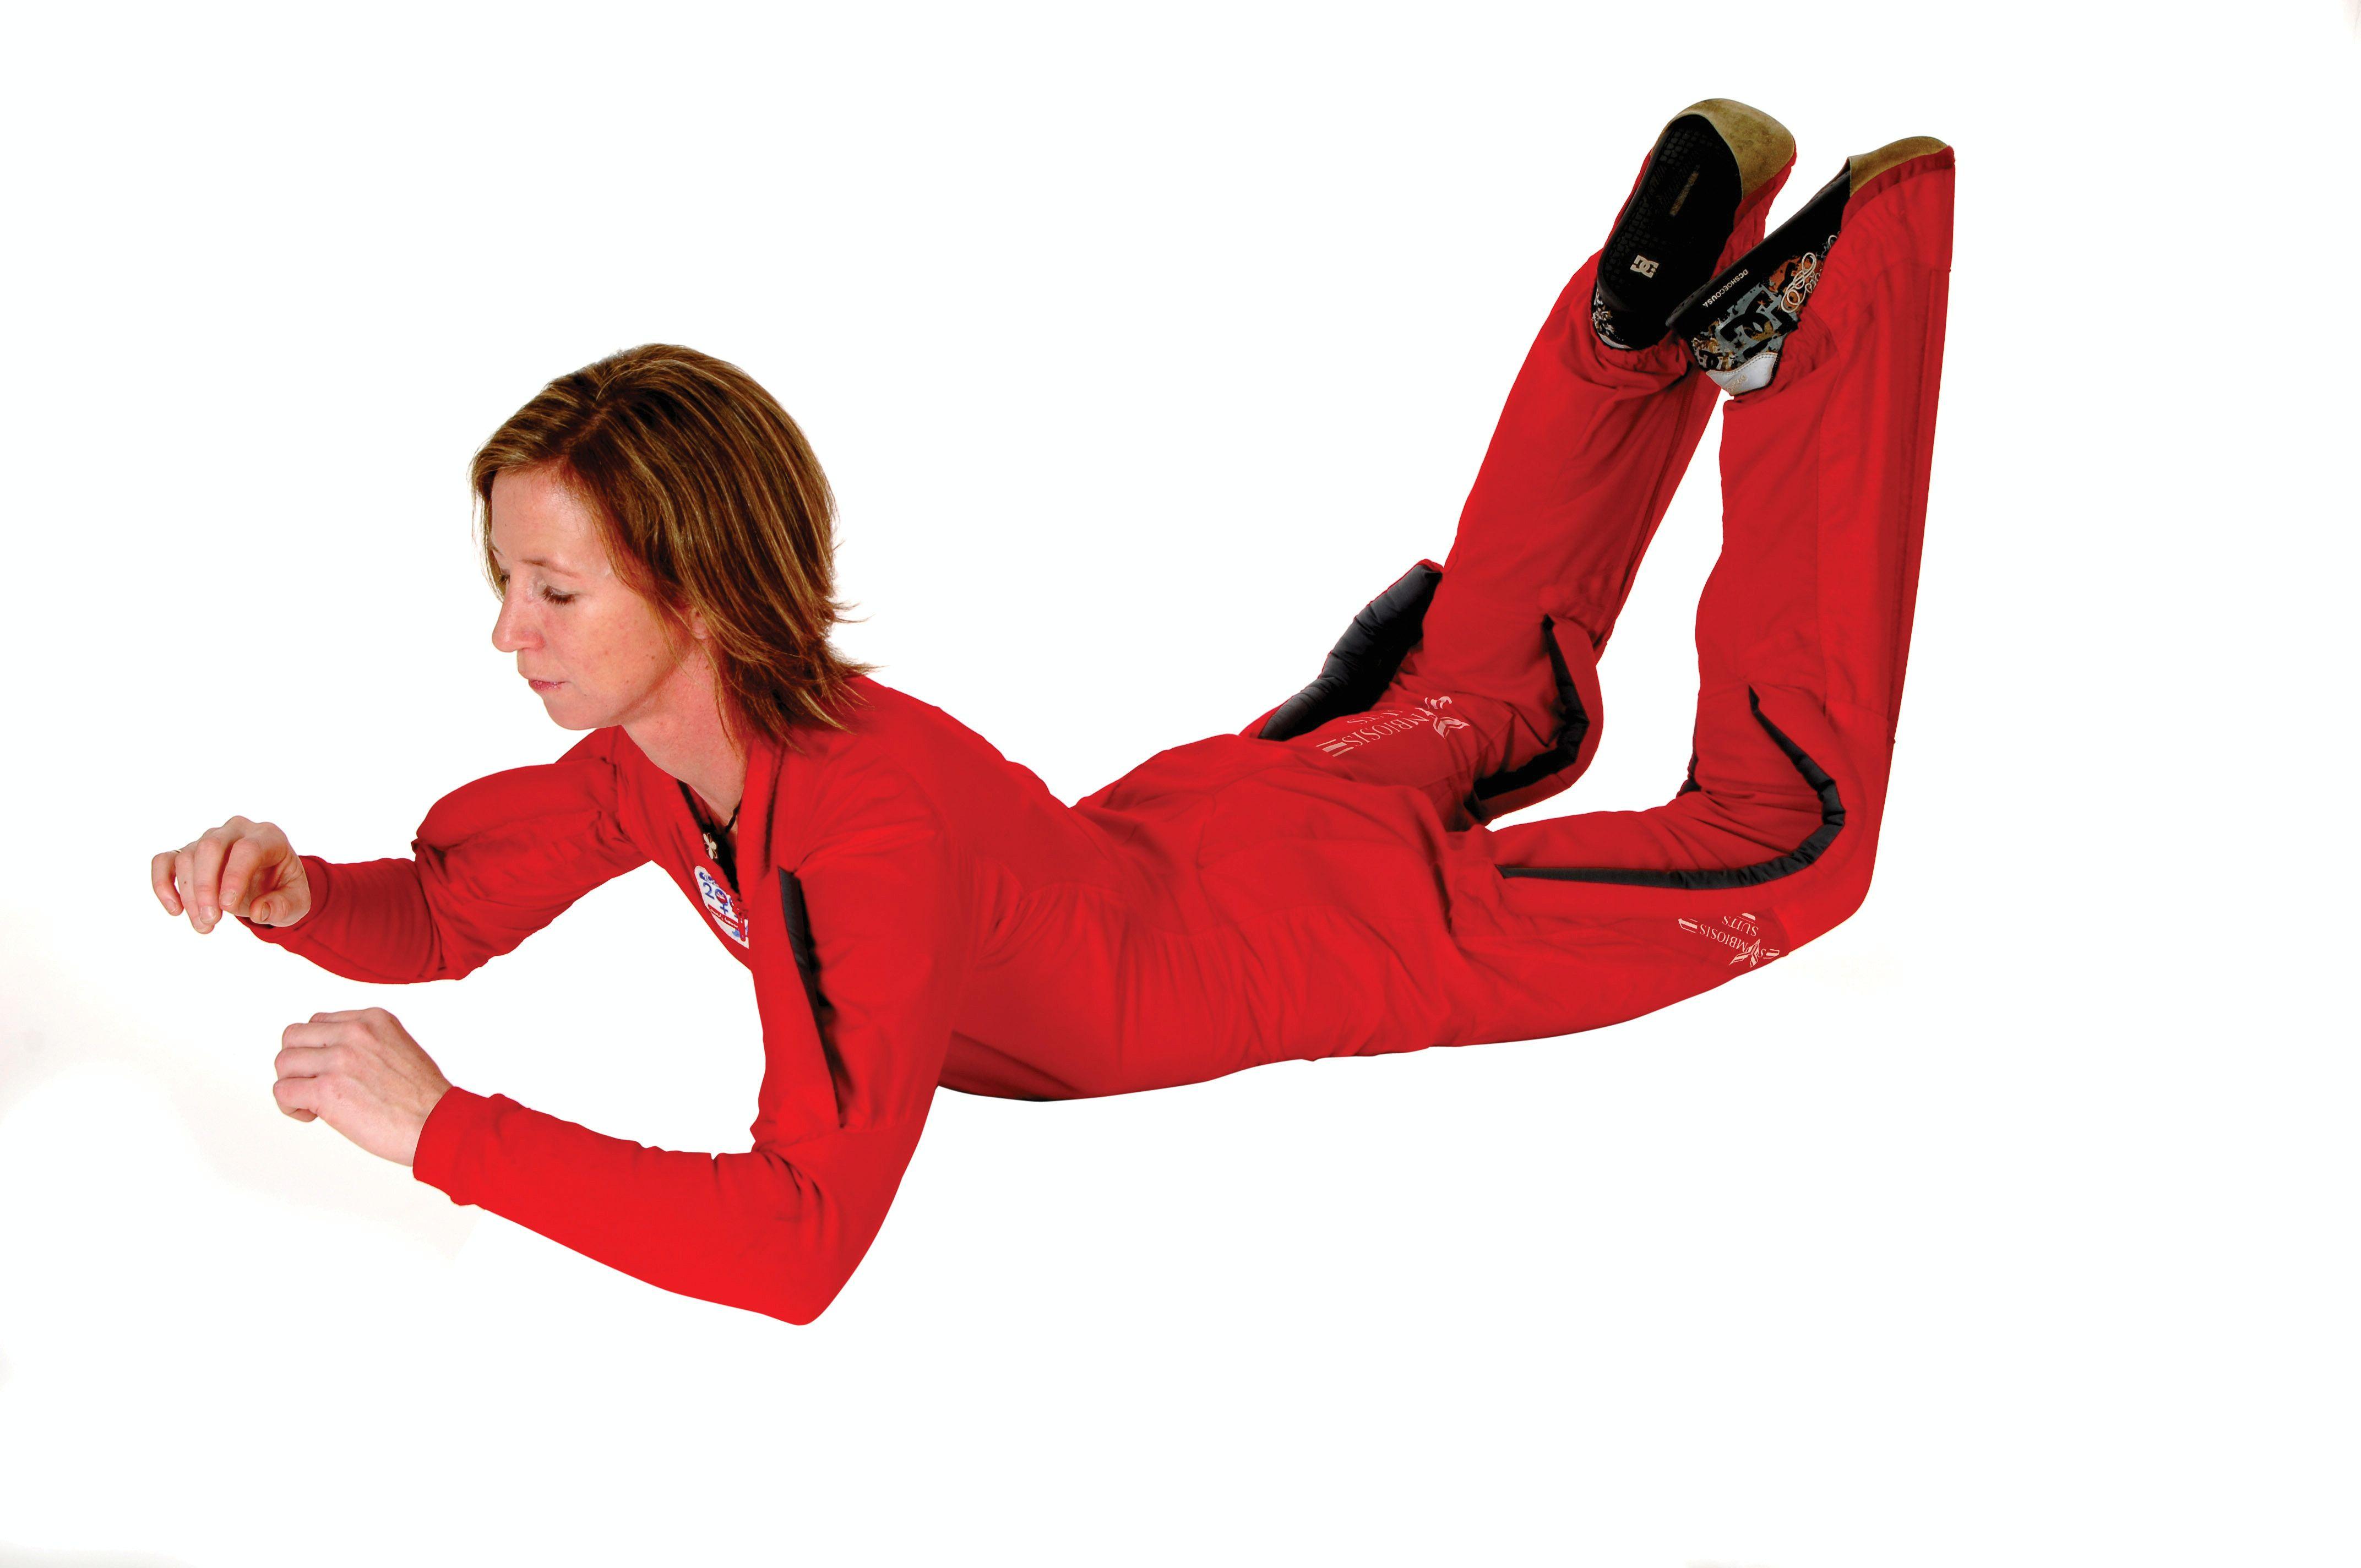 Good FS neutral body position